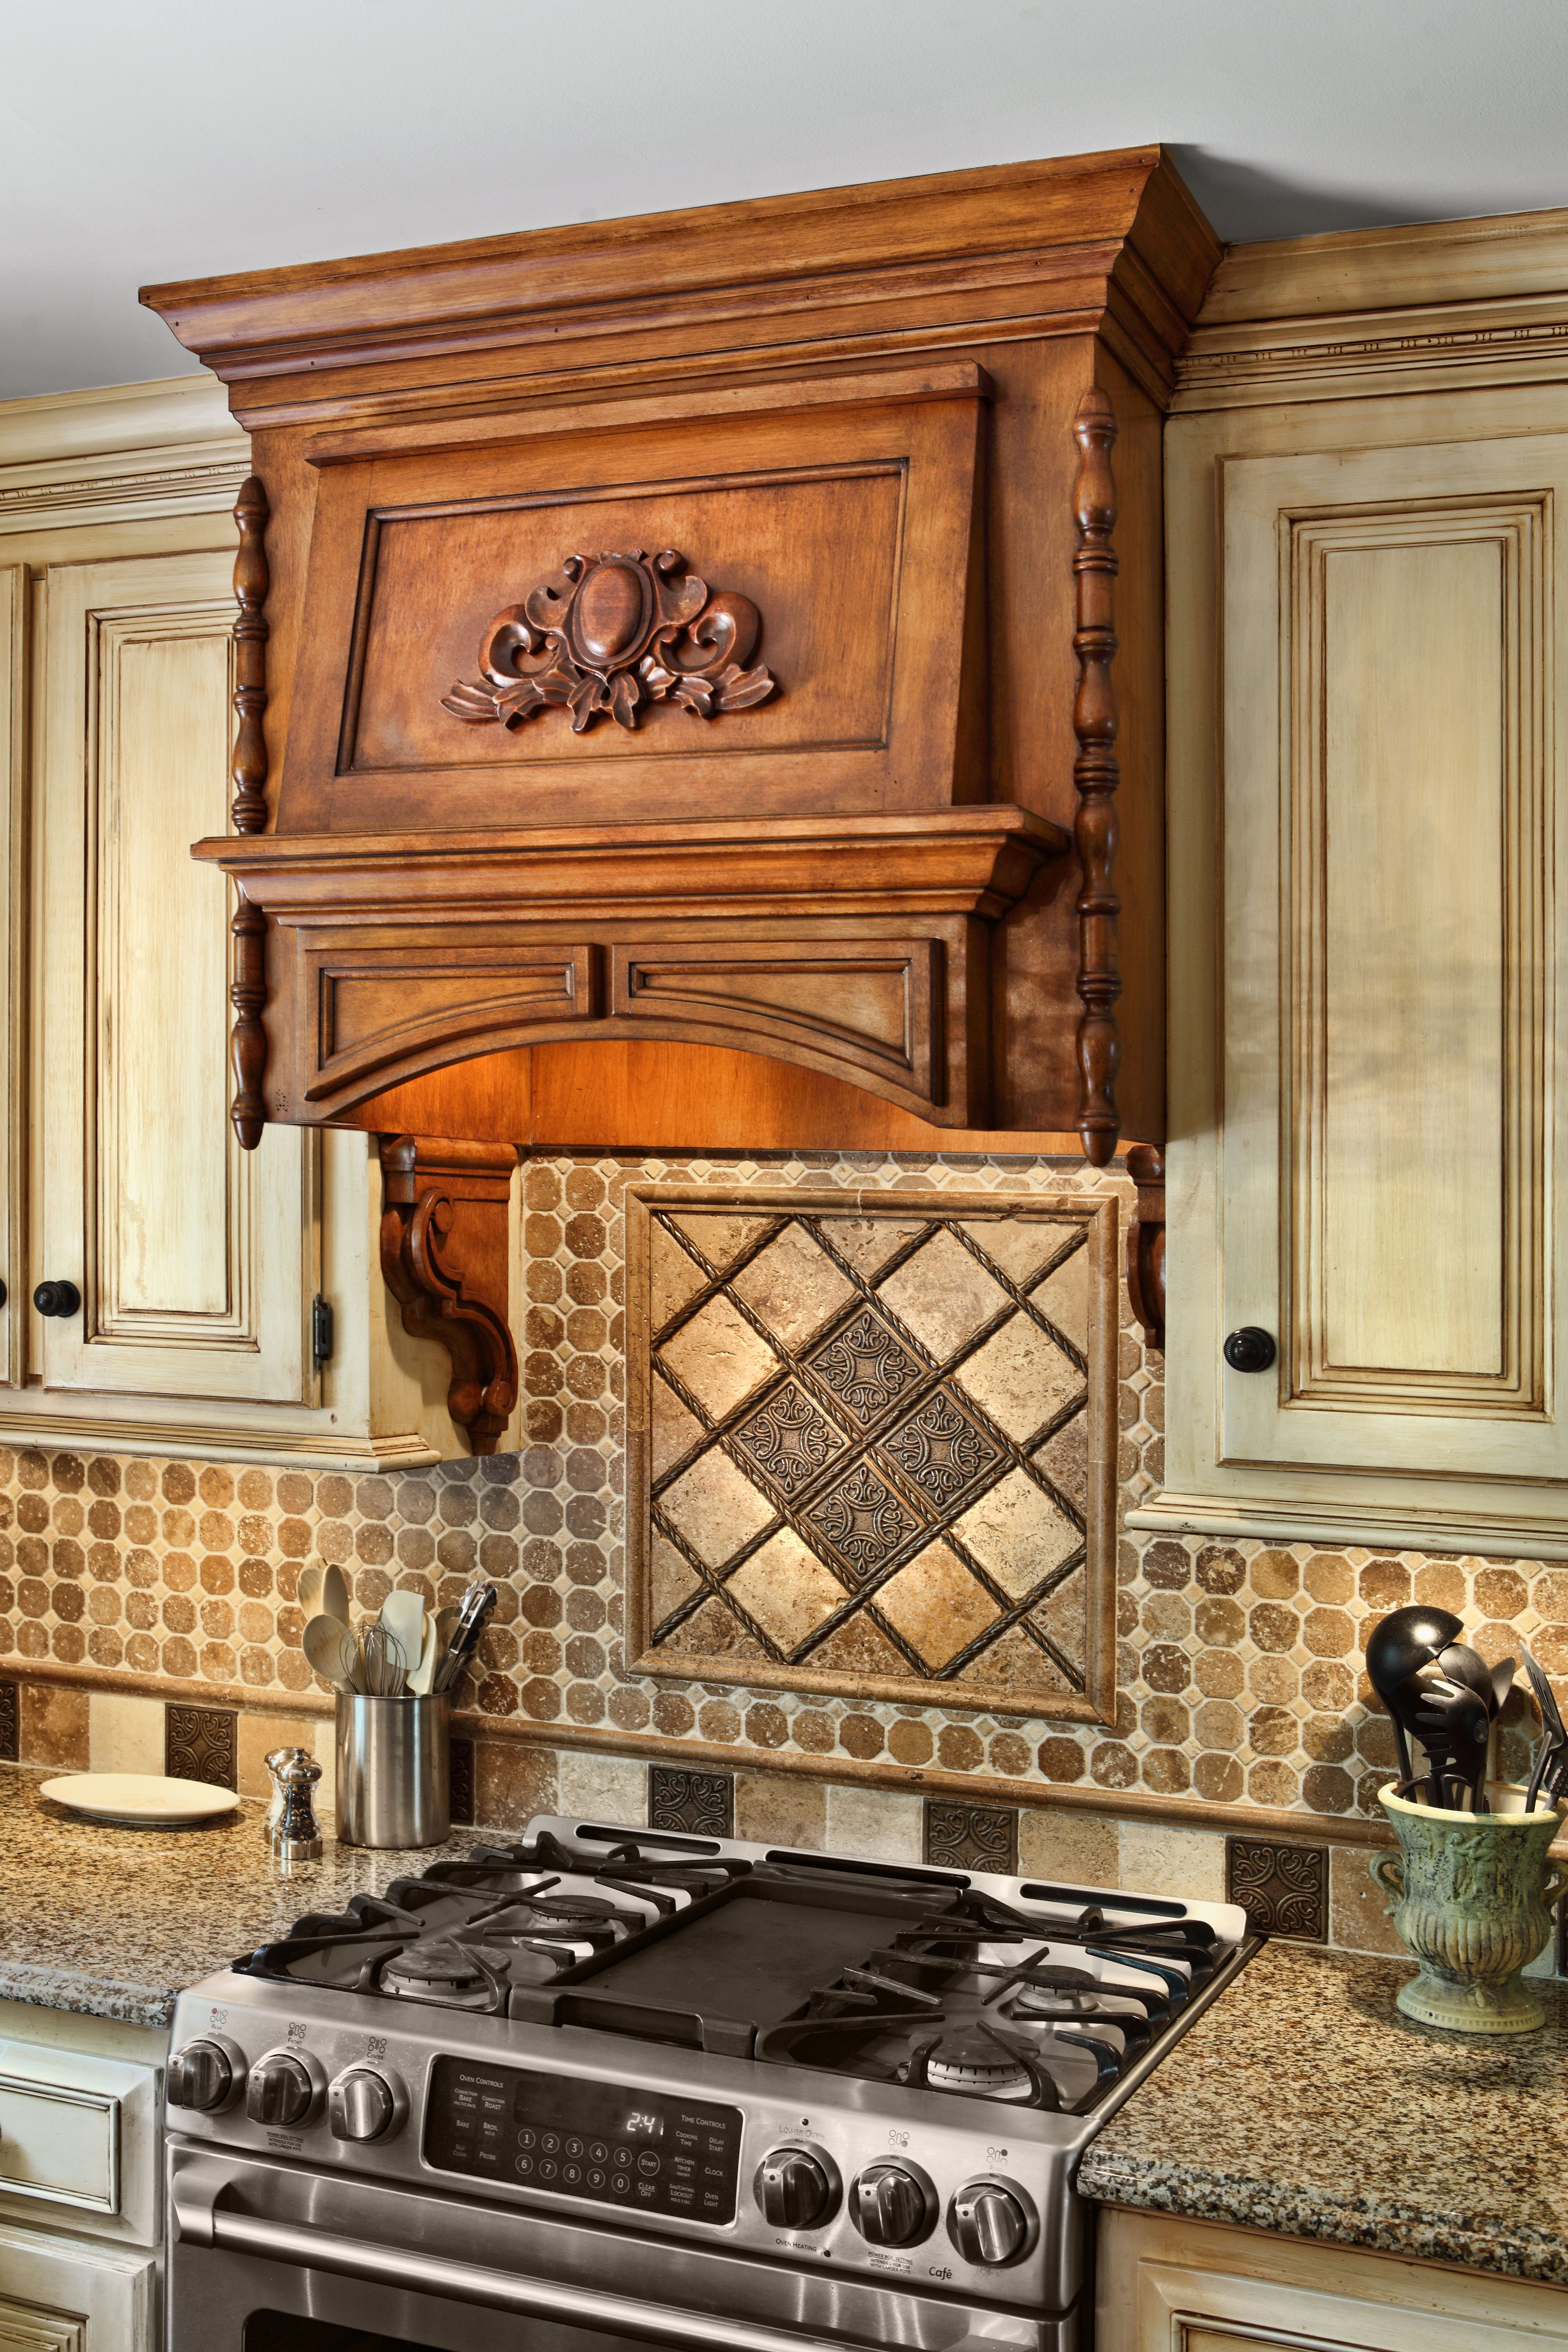 High Quality Valerie Garrett Interior Design. Macon, Georgia. Kitchen Backsplash